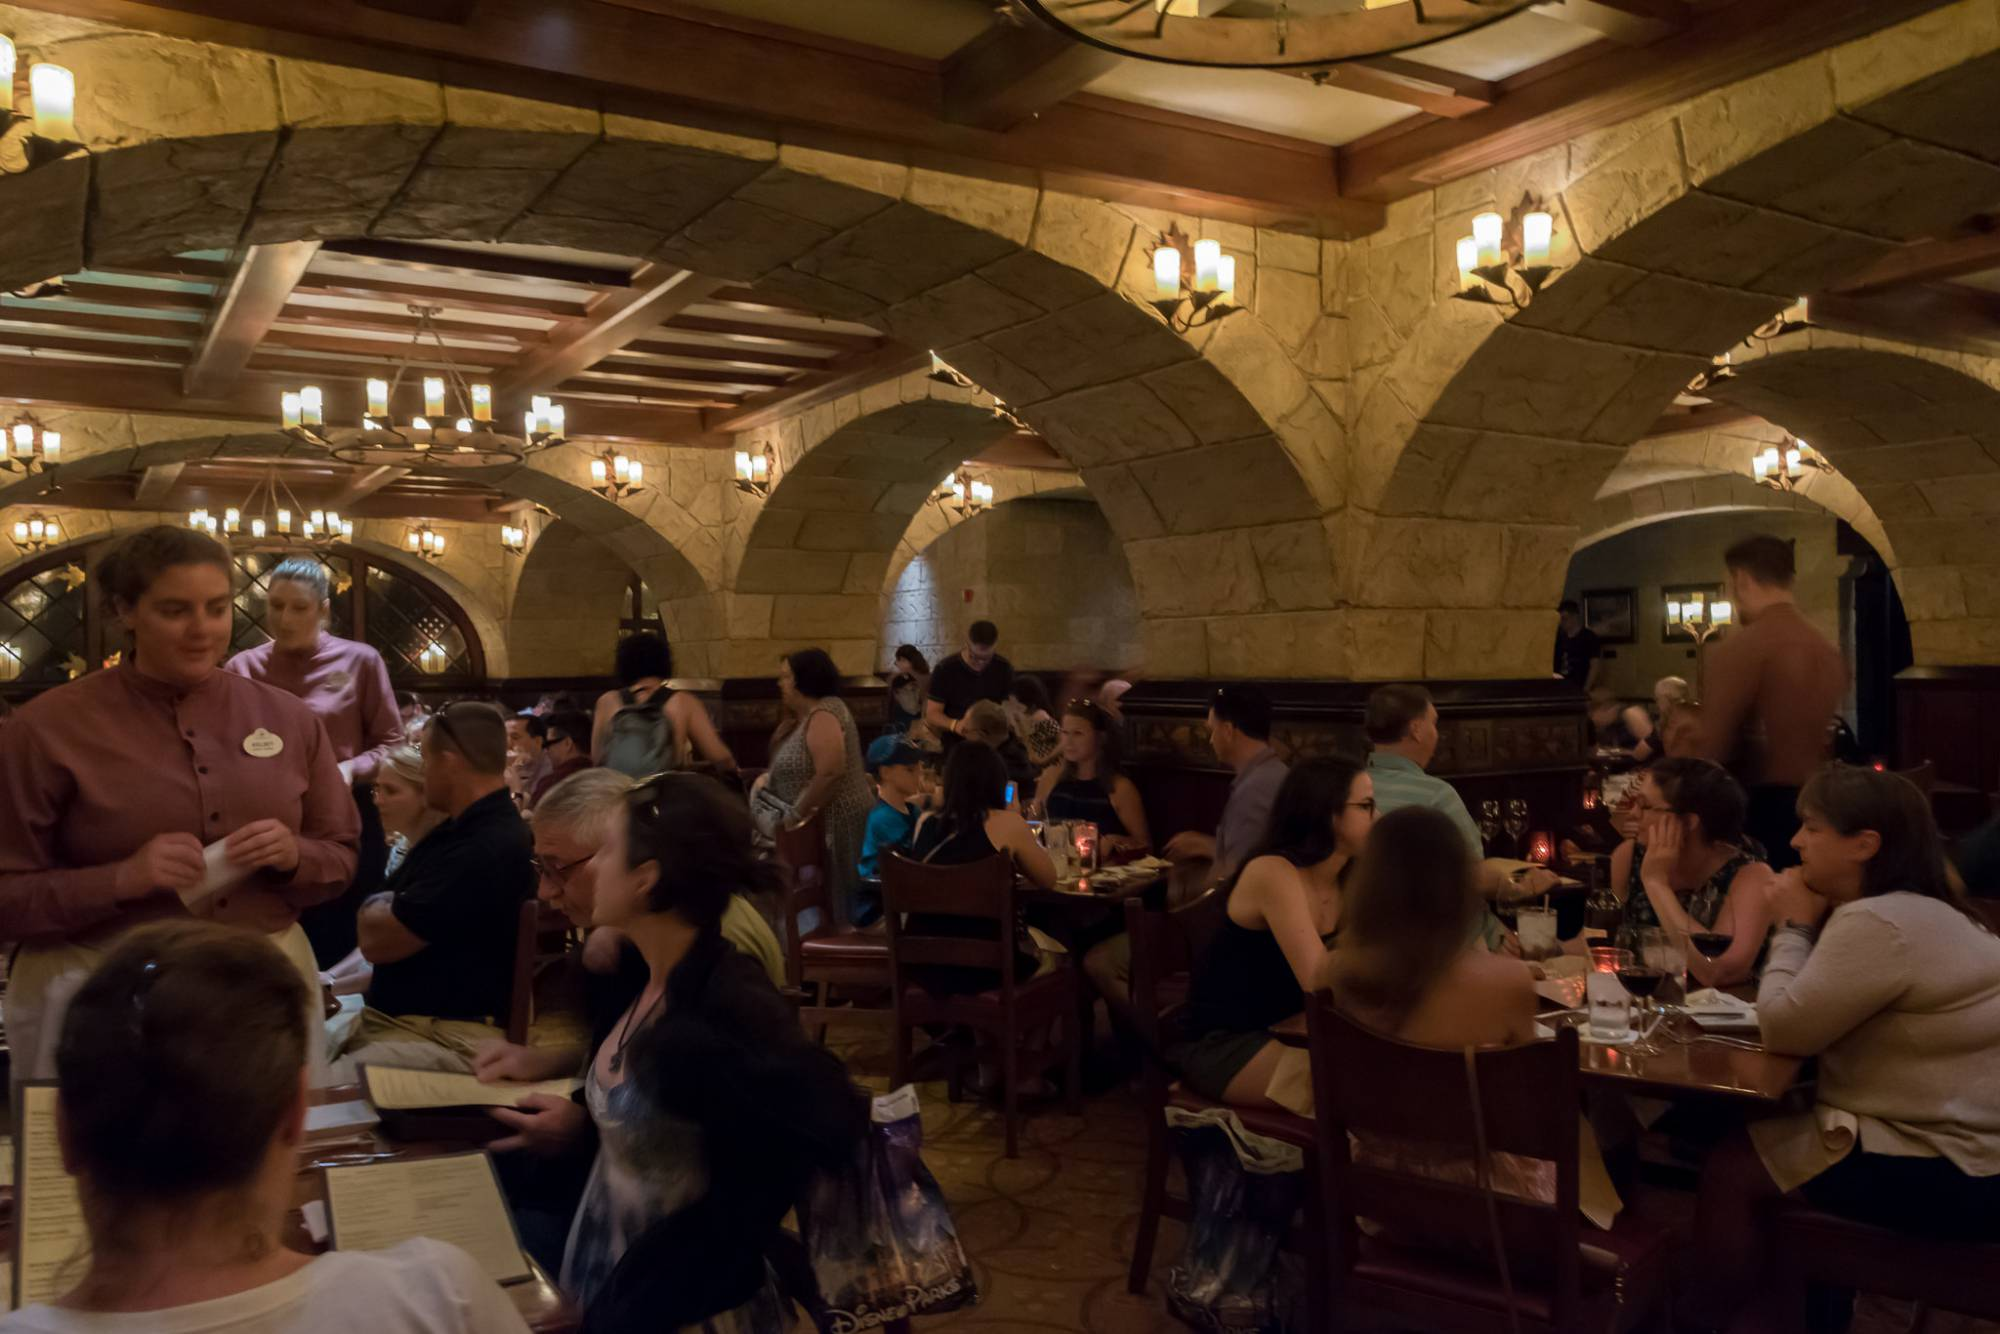 Enjoy a delicious dinner at Le Cellier at Epcot | PassPorter.com